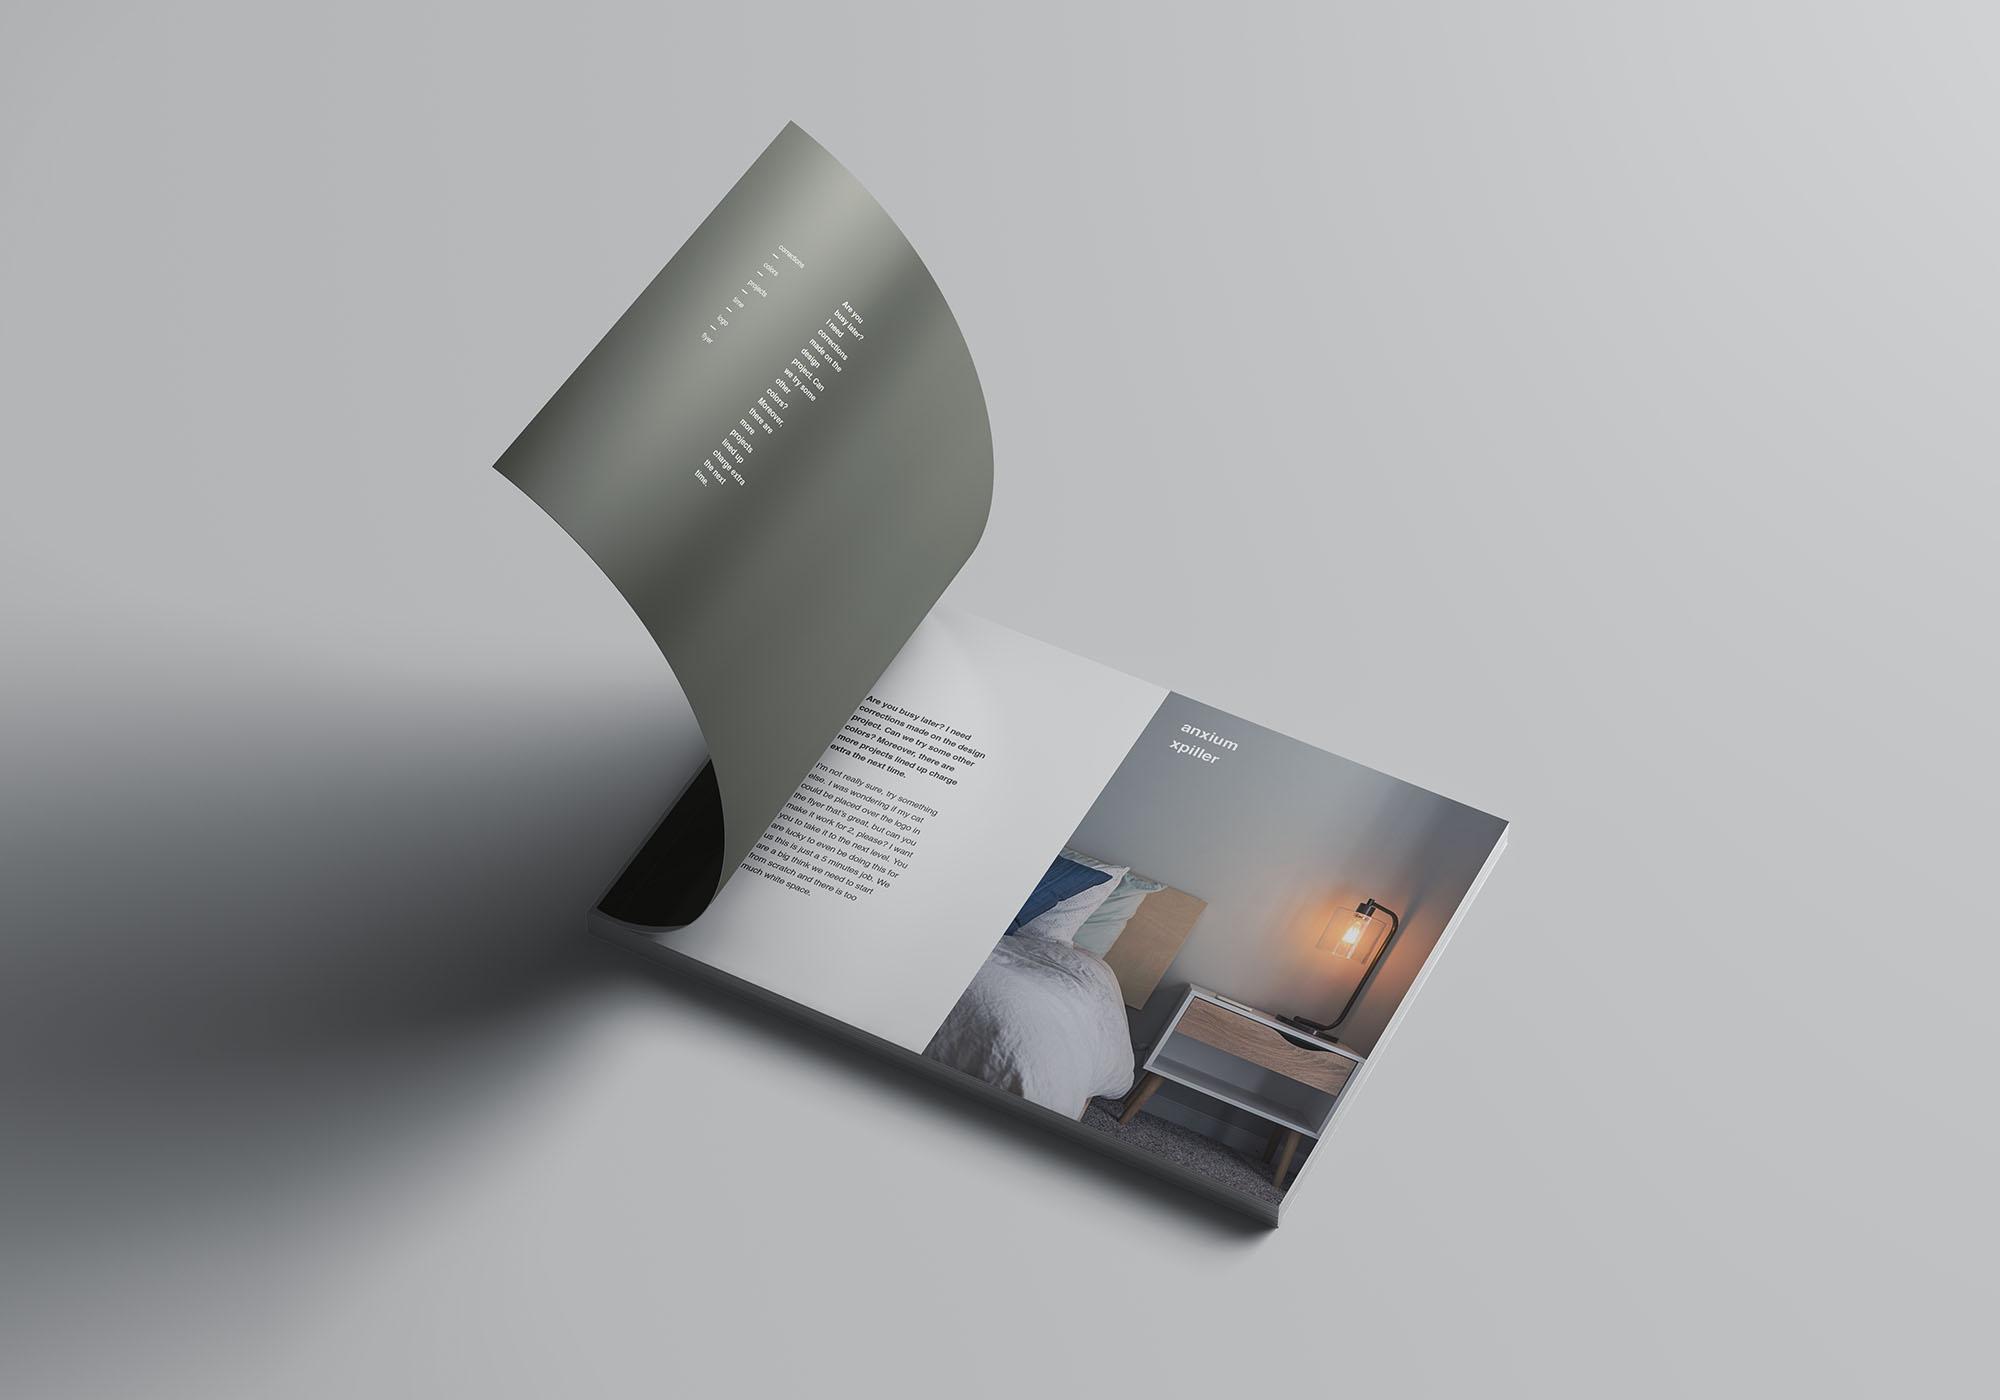 A4书籍画册杂志设计效果图样机模板 A4 Landscape Perfect Binding Brochure Mockup插图(2)